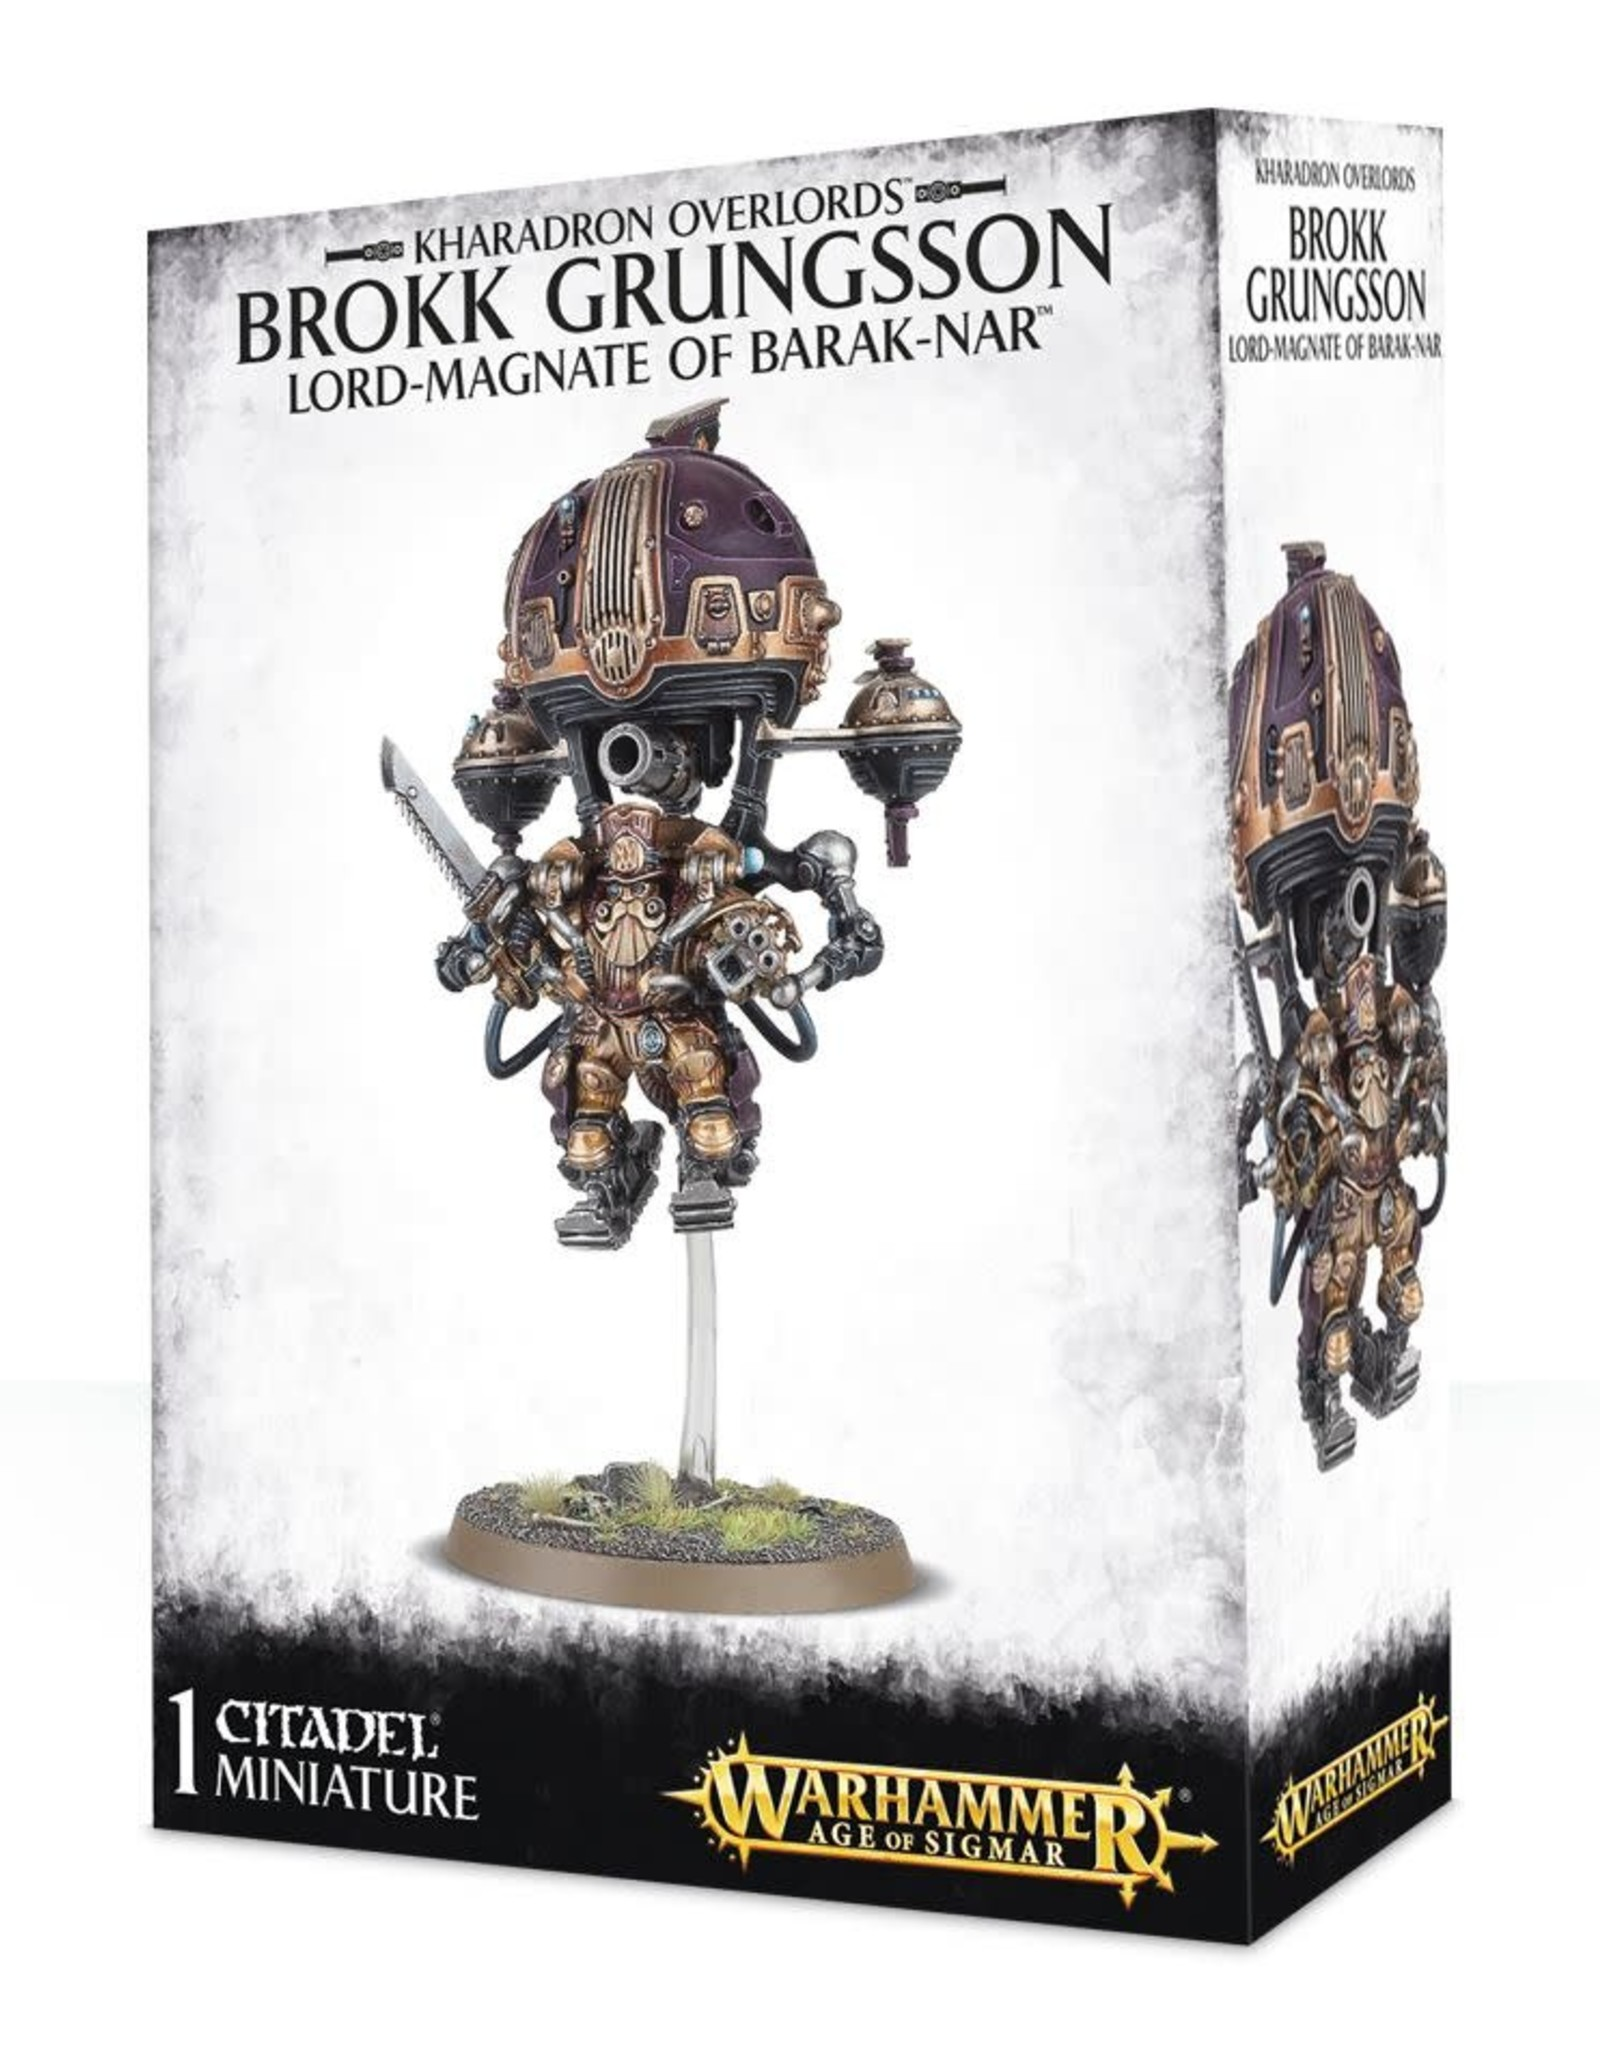 Age of Sigmar Brokk Grungsson Lord-Magnate Barak-Nar